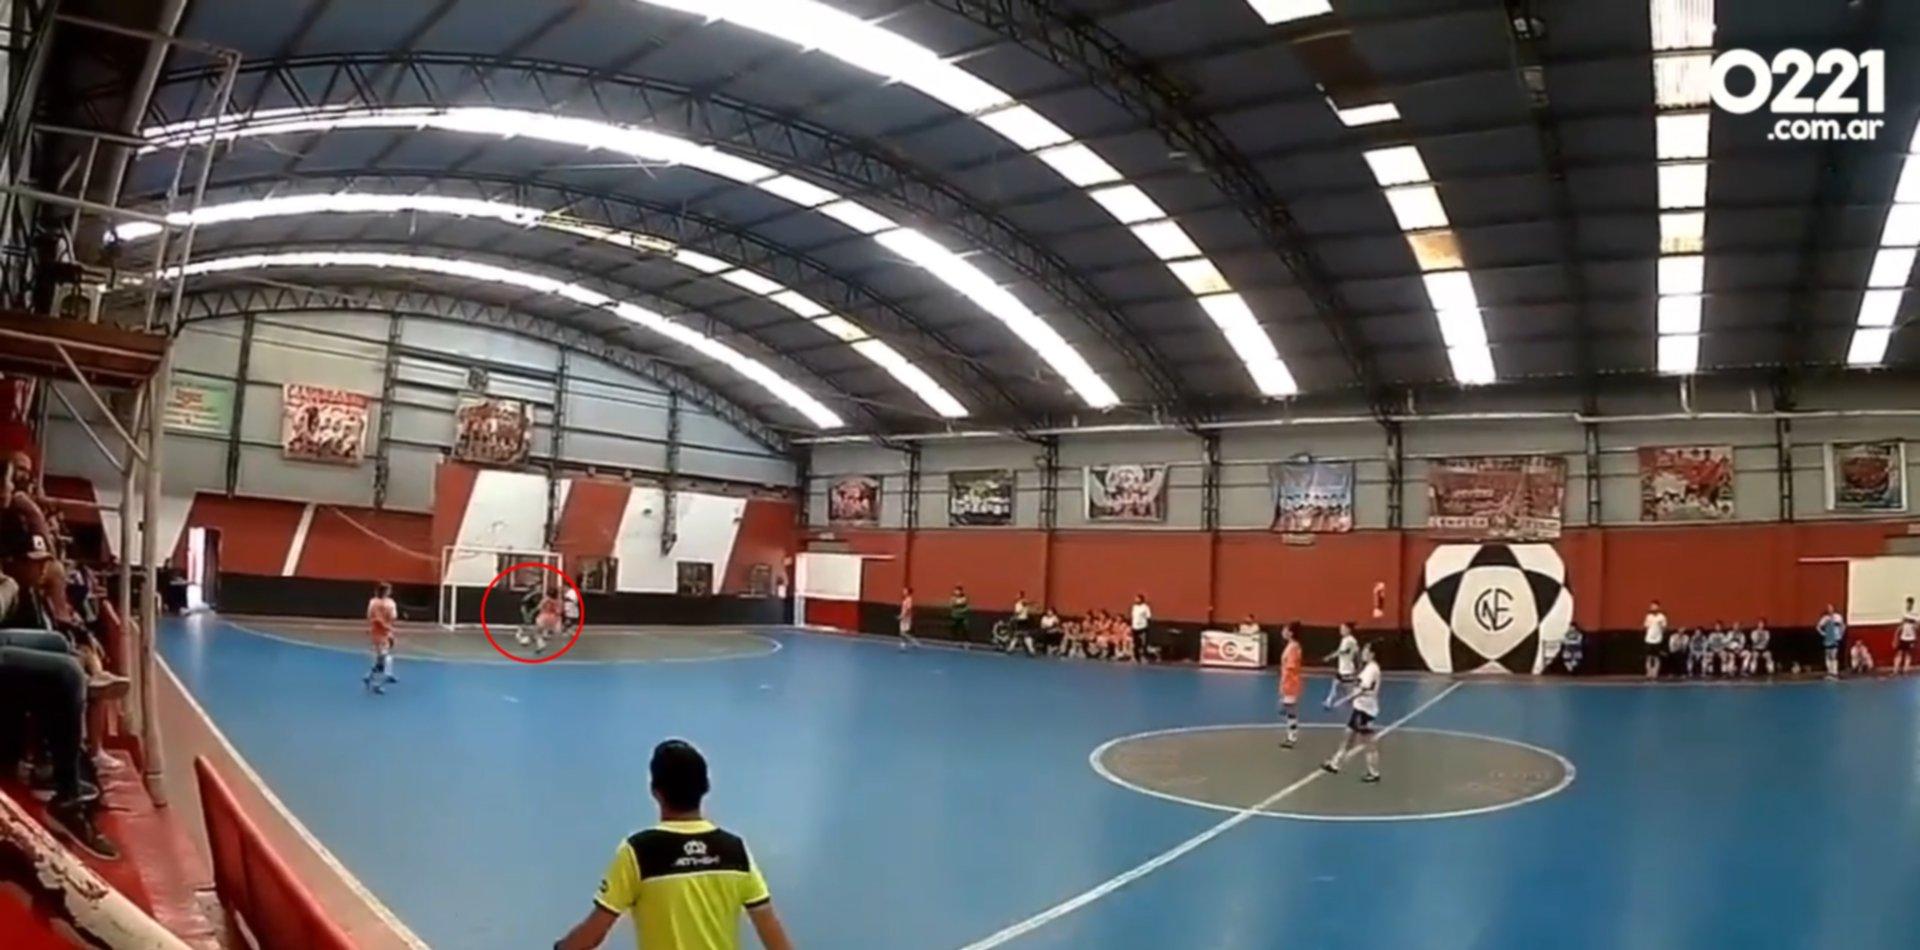 VIDEO: La vergonzosa actitud antideportiva de Banfield contra Gimnasia en el Futsal